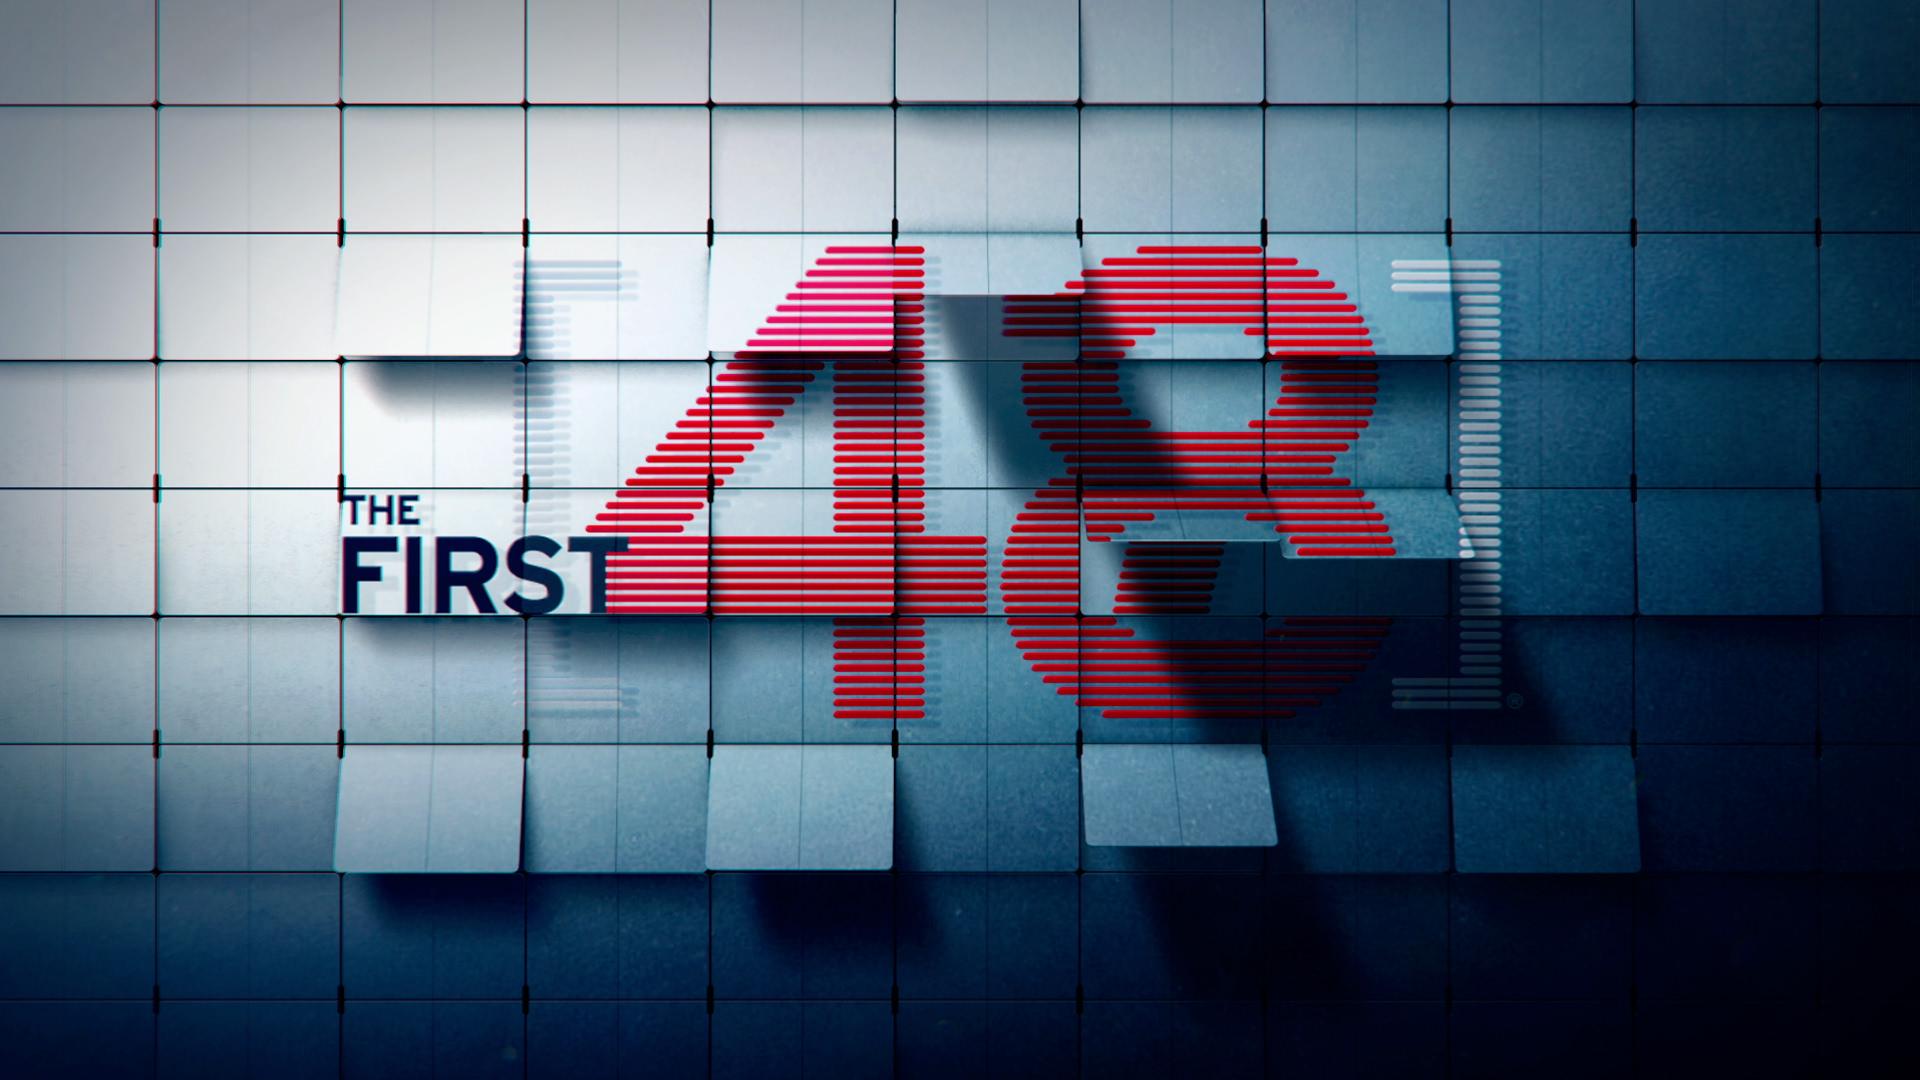 The fist 48